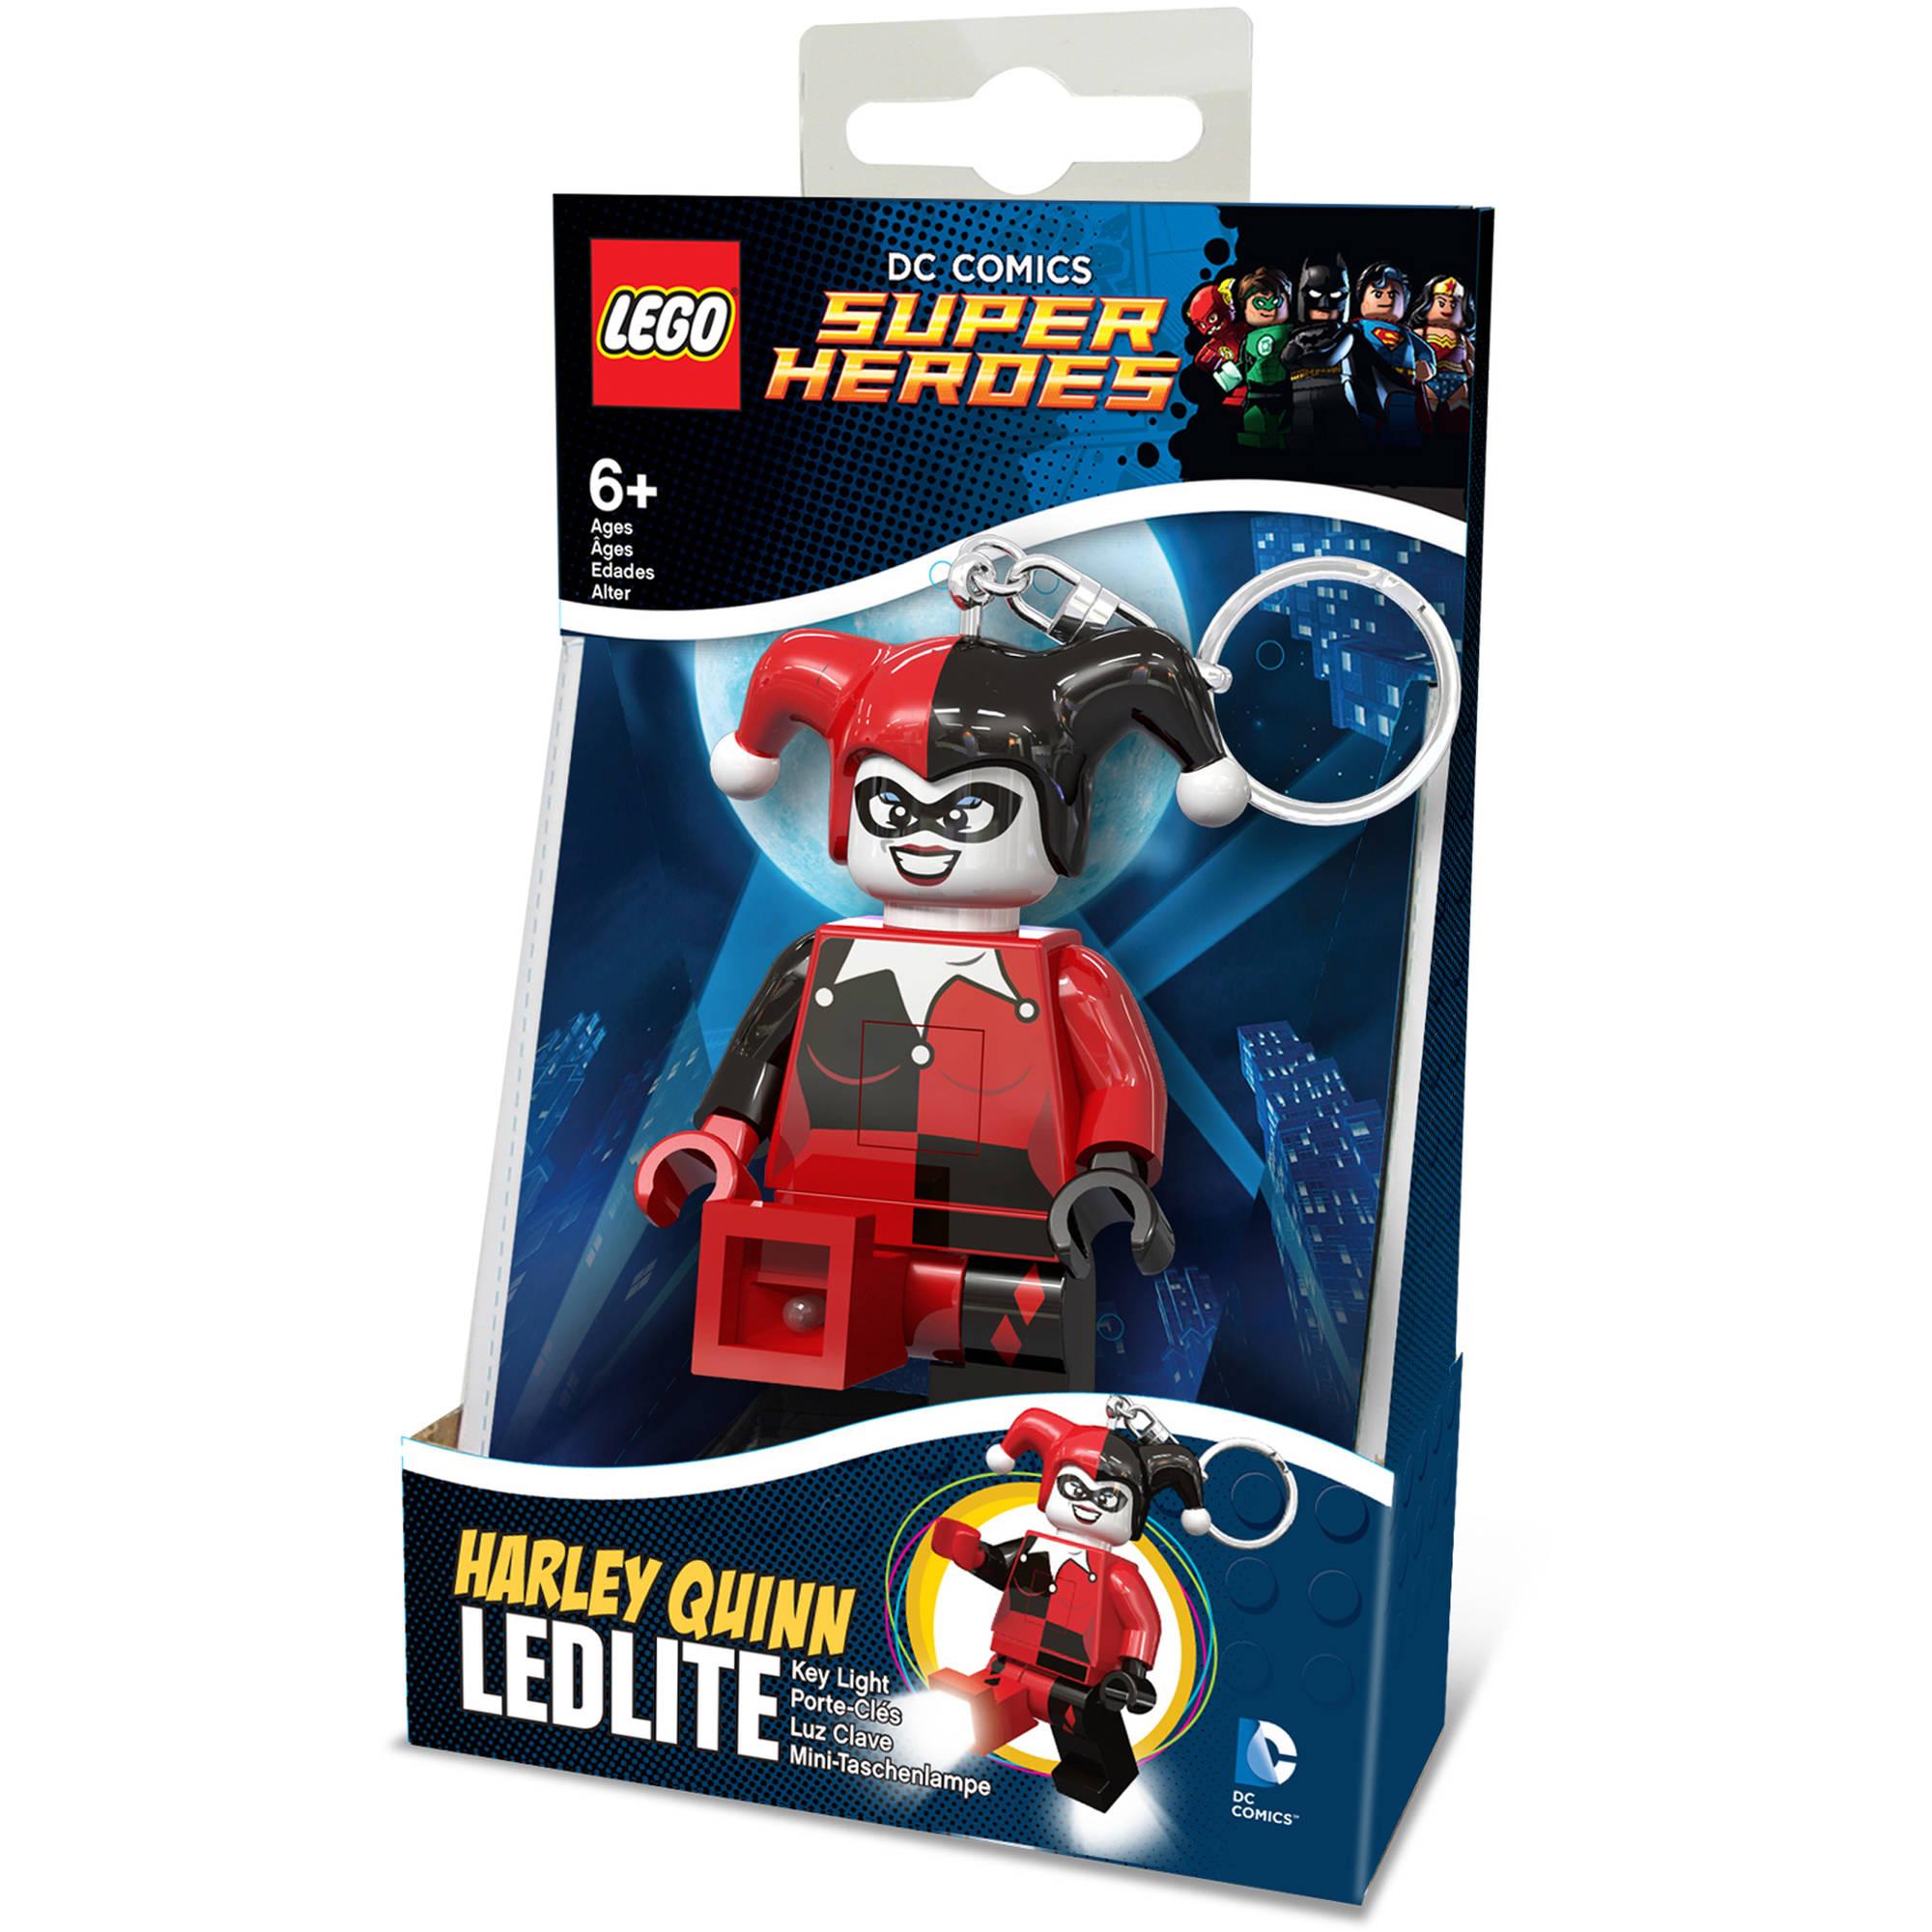 Santoki LED Key Light, Lego DC Universe Harley Quinn by Santoki